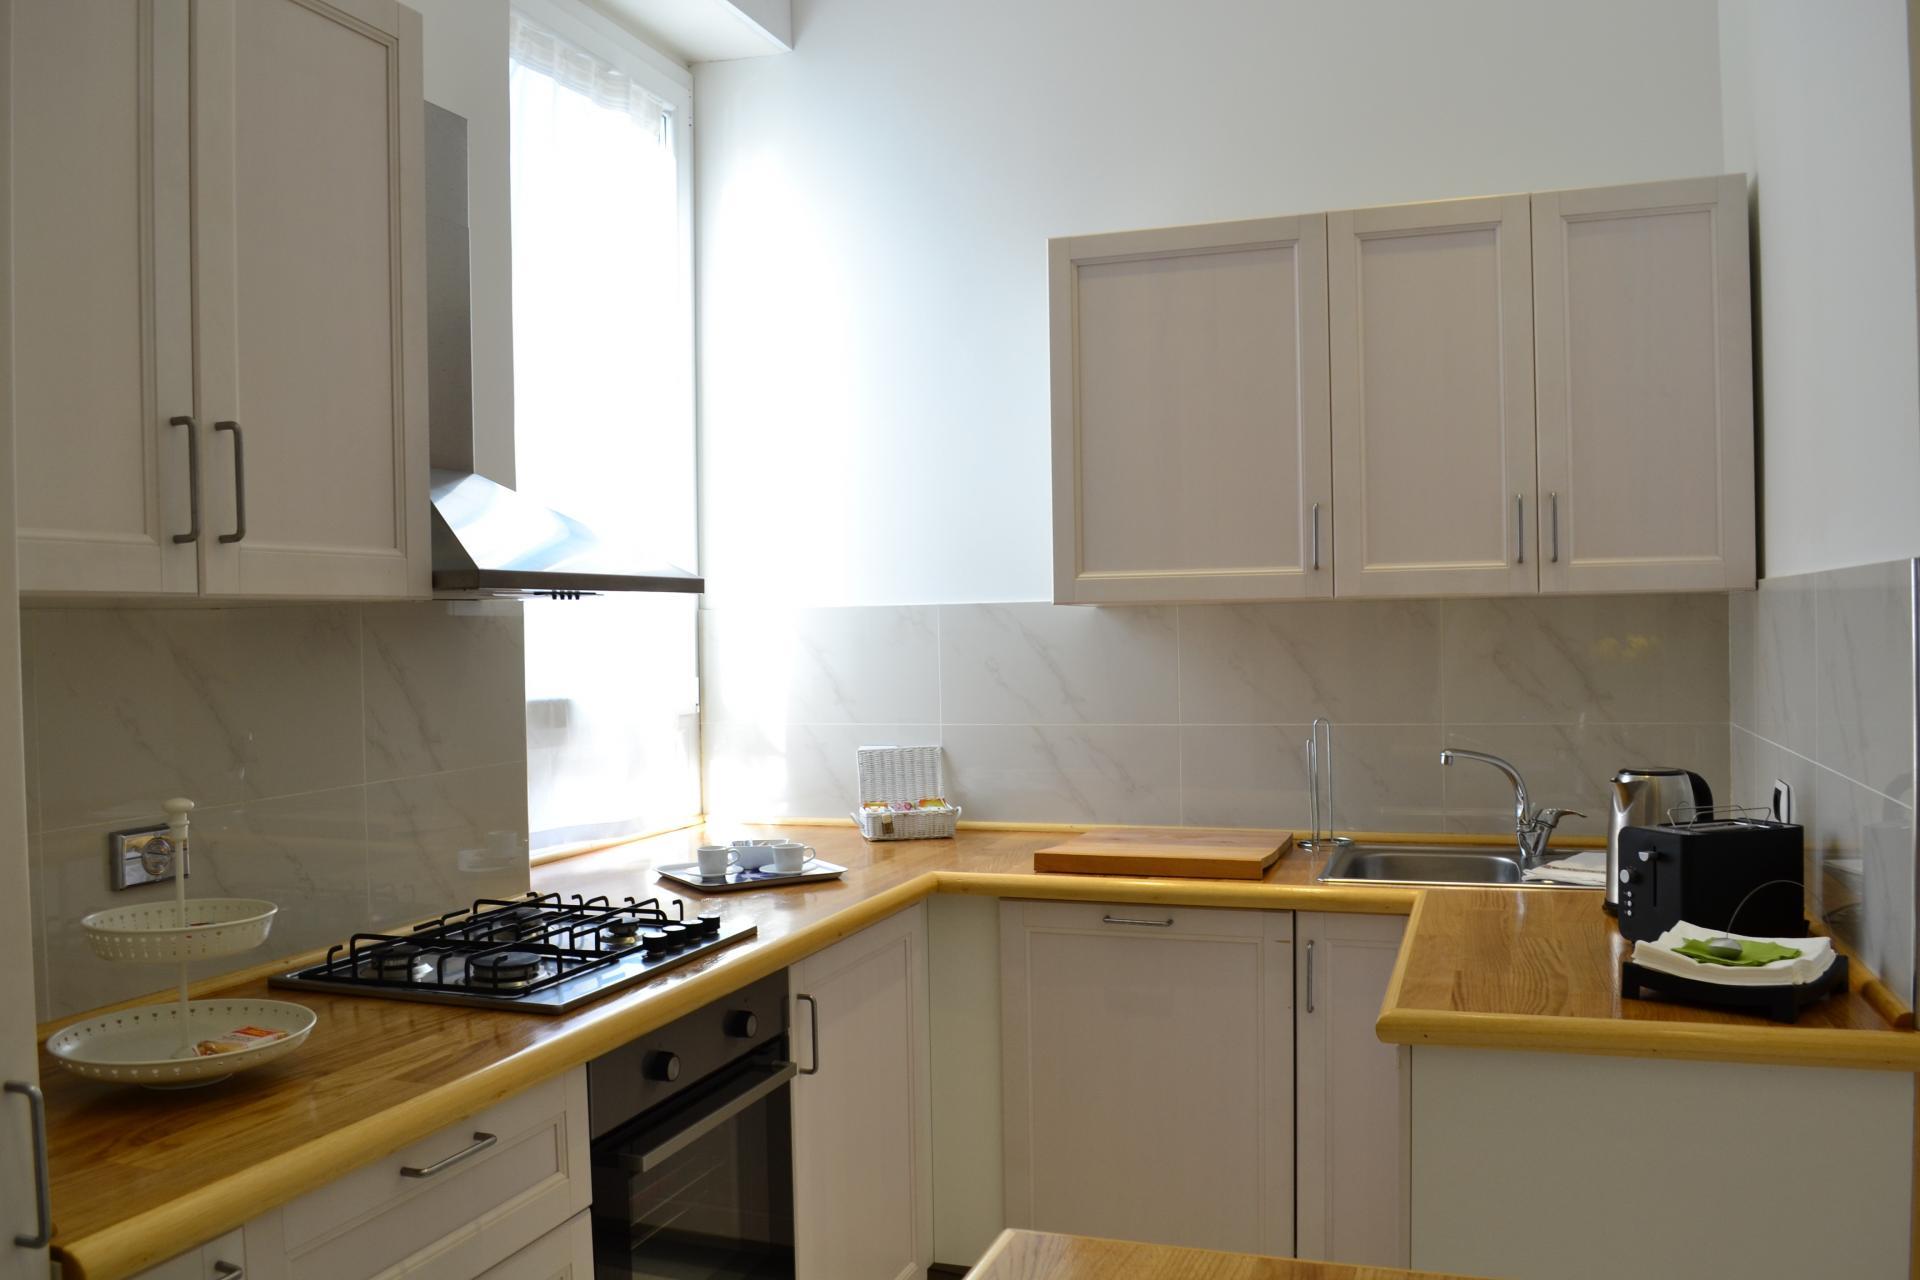 Kitchen at Angelico Grand Apartment, Prati, Rome